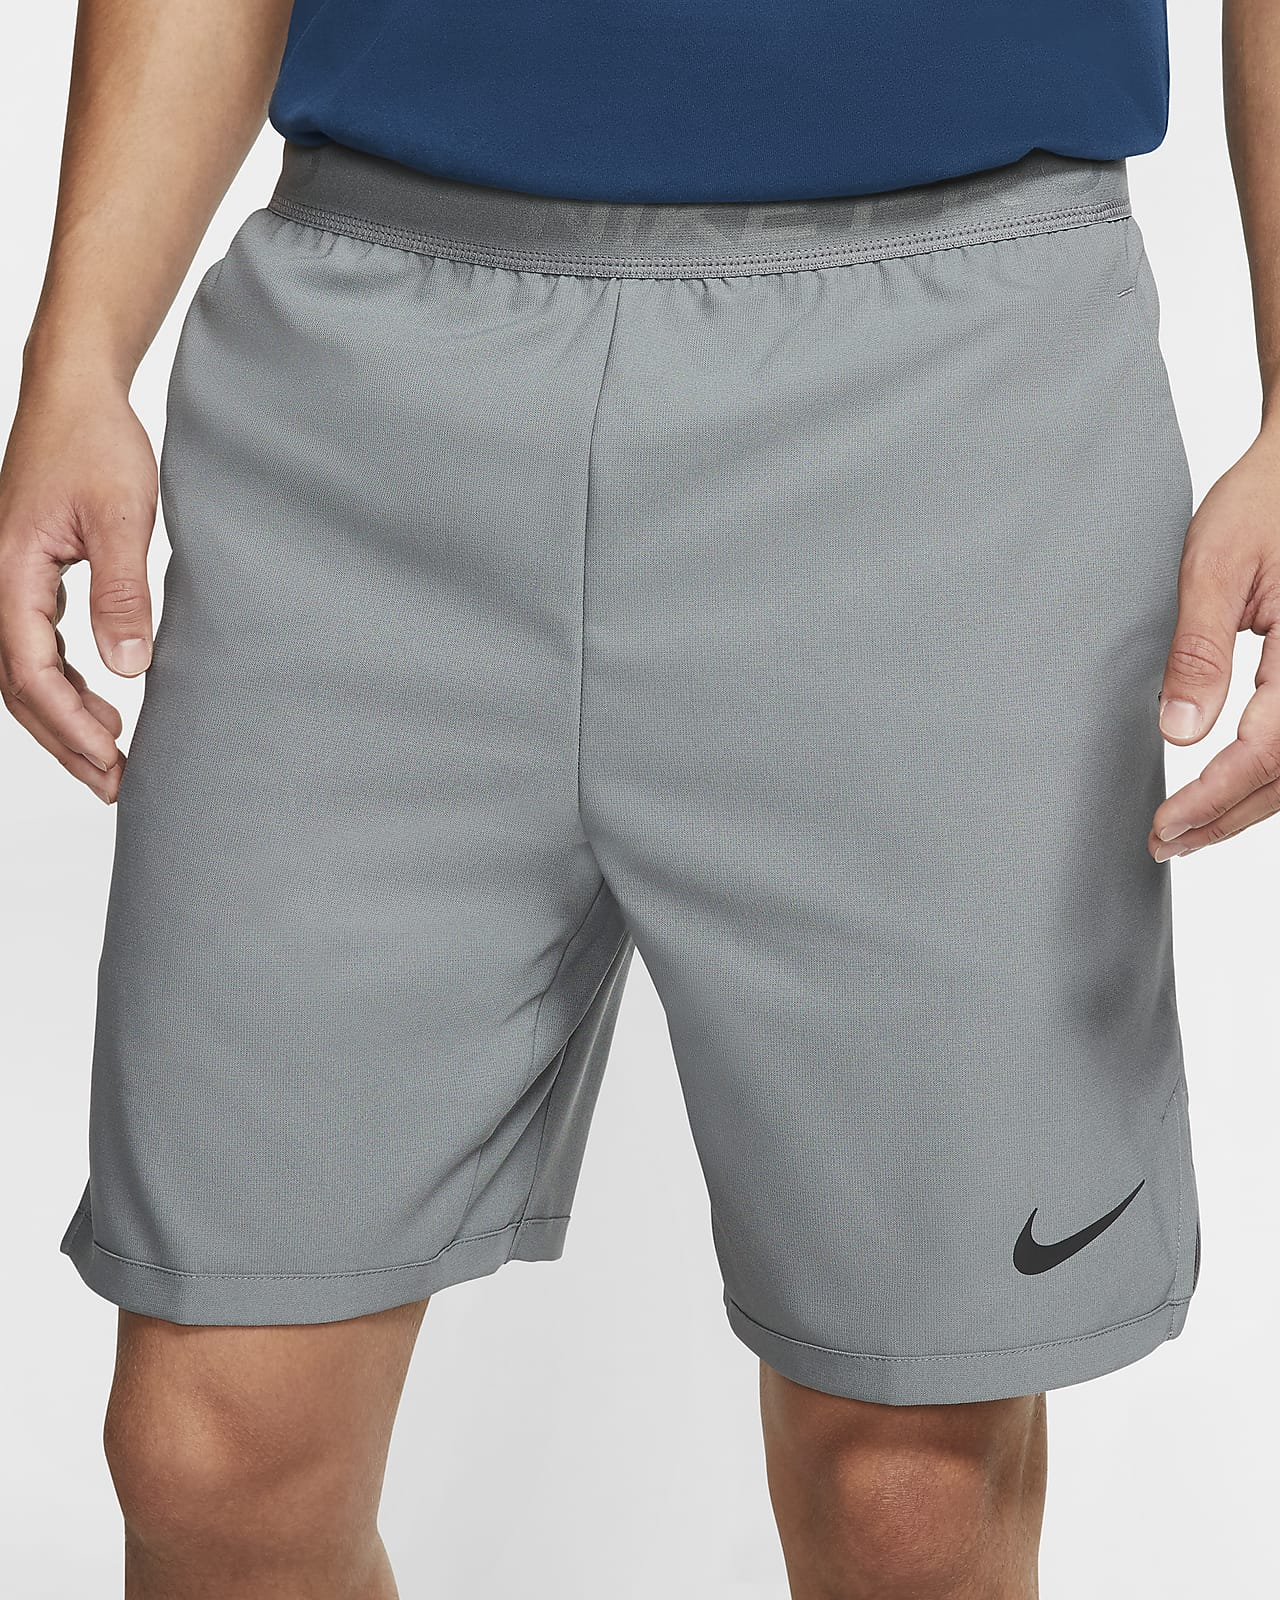 Nike Pro Flex Vent Max herreshorts